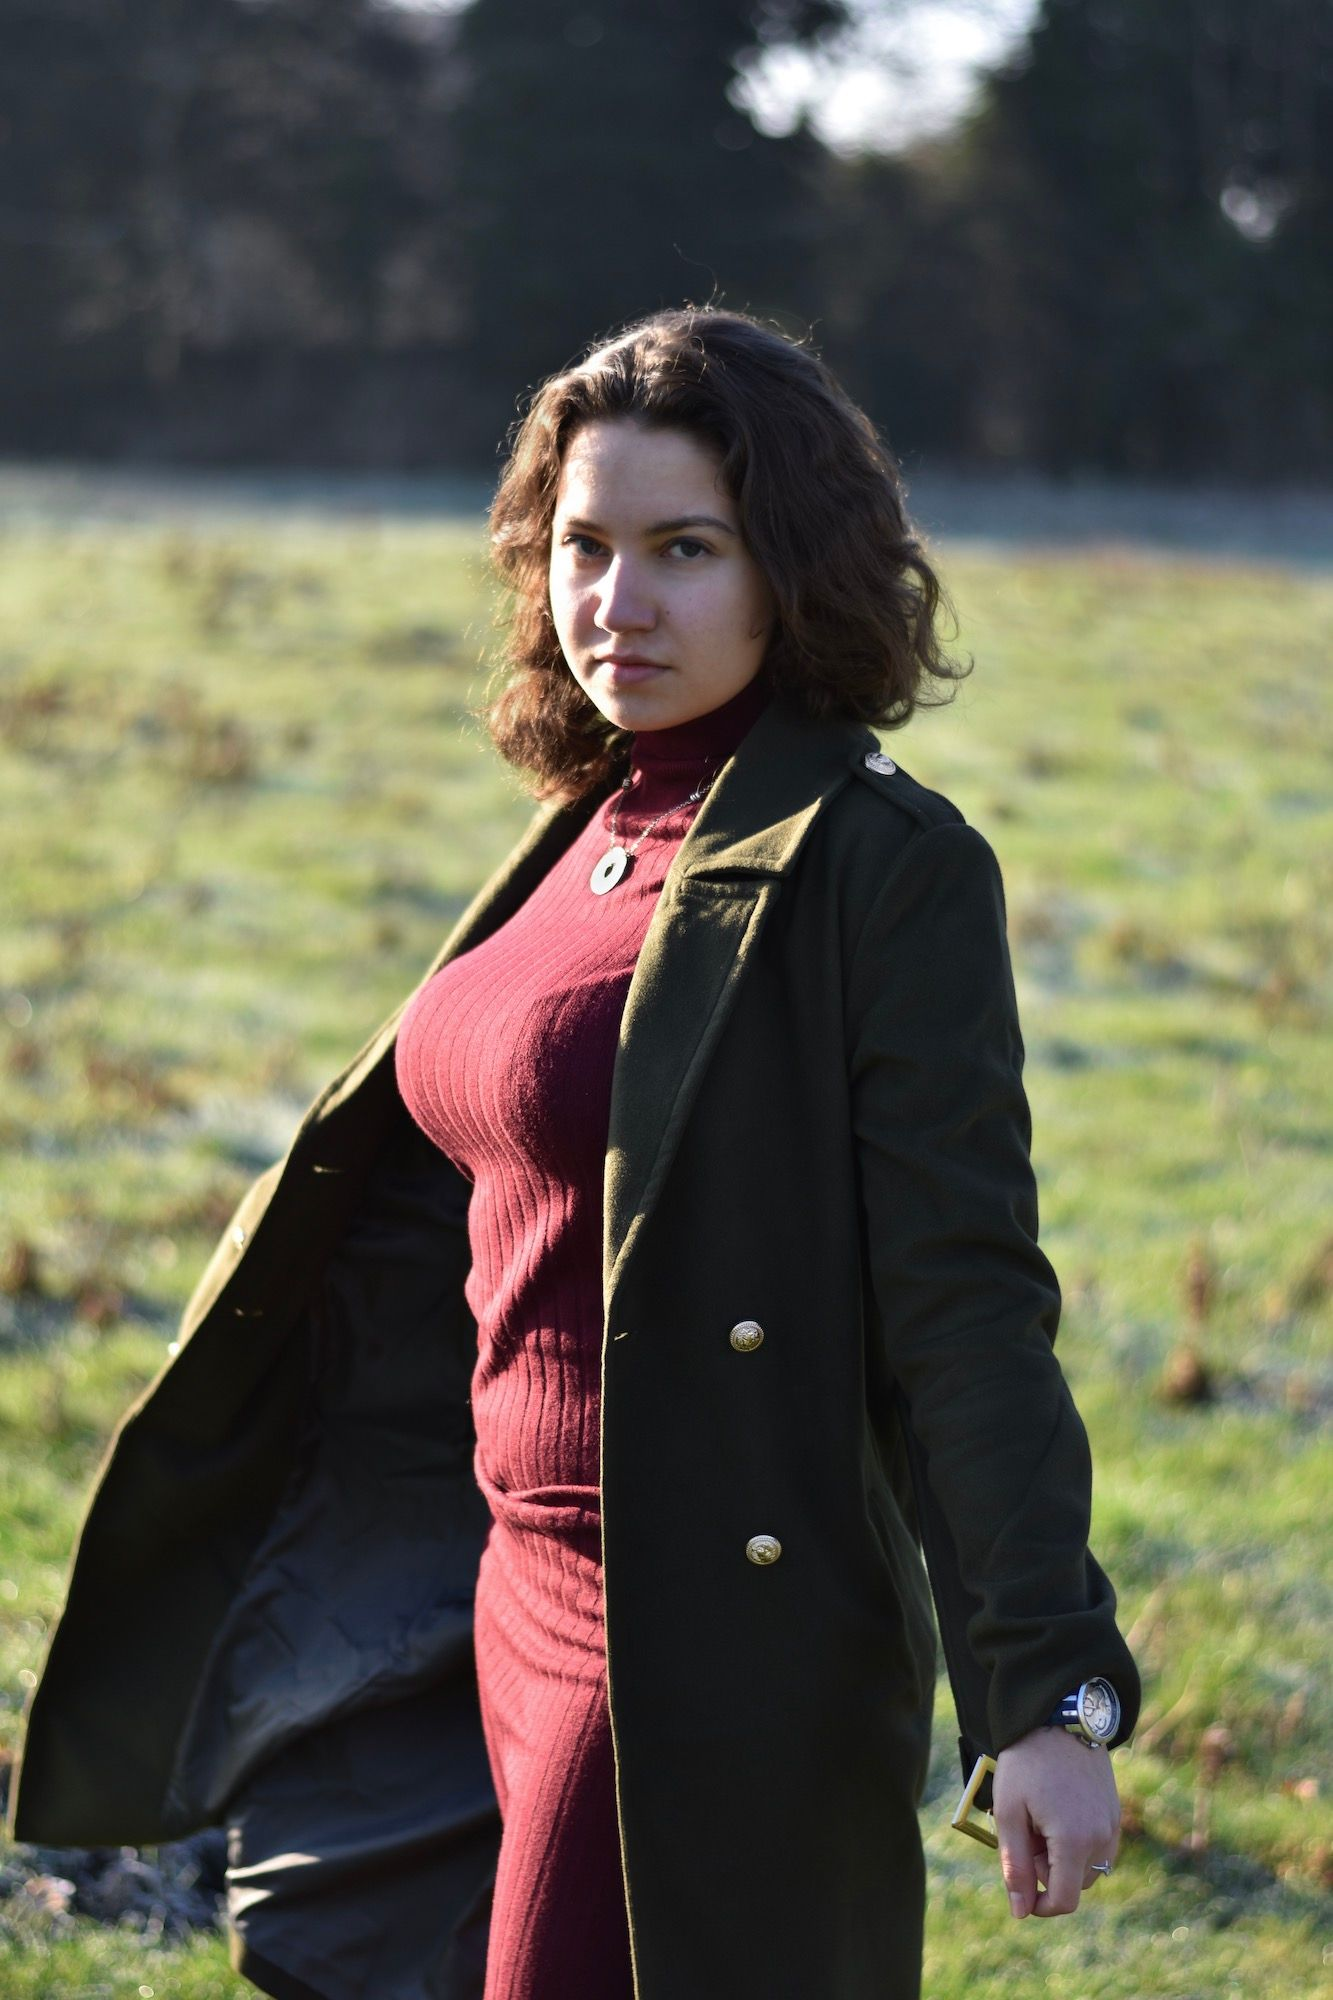 Image may contain: Sleeve, Person, Human, Overcoat, Blazer, Jacket, Coat, Apparel, Clothing